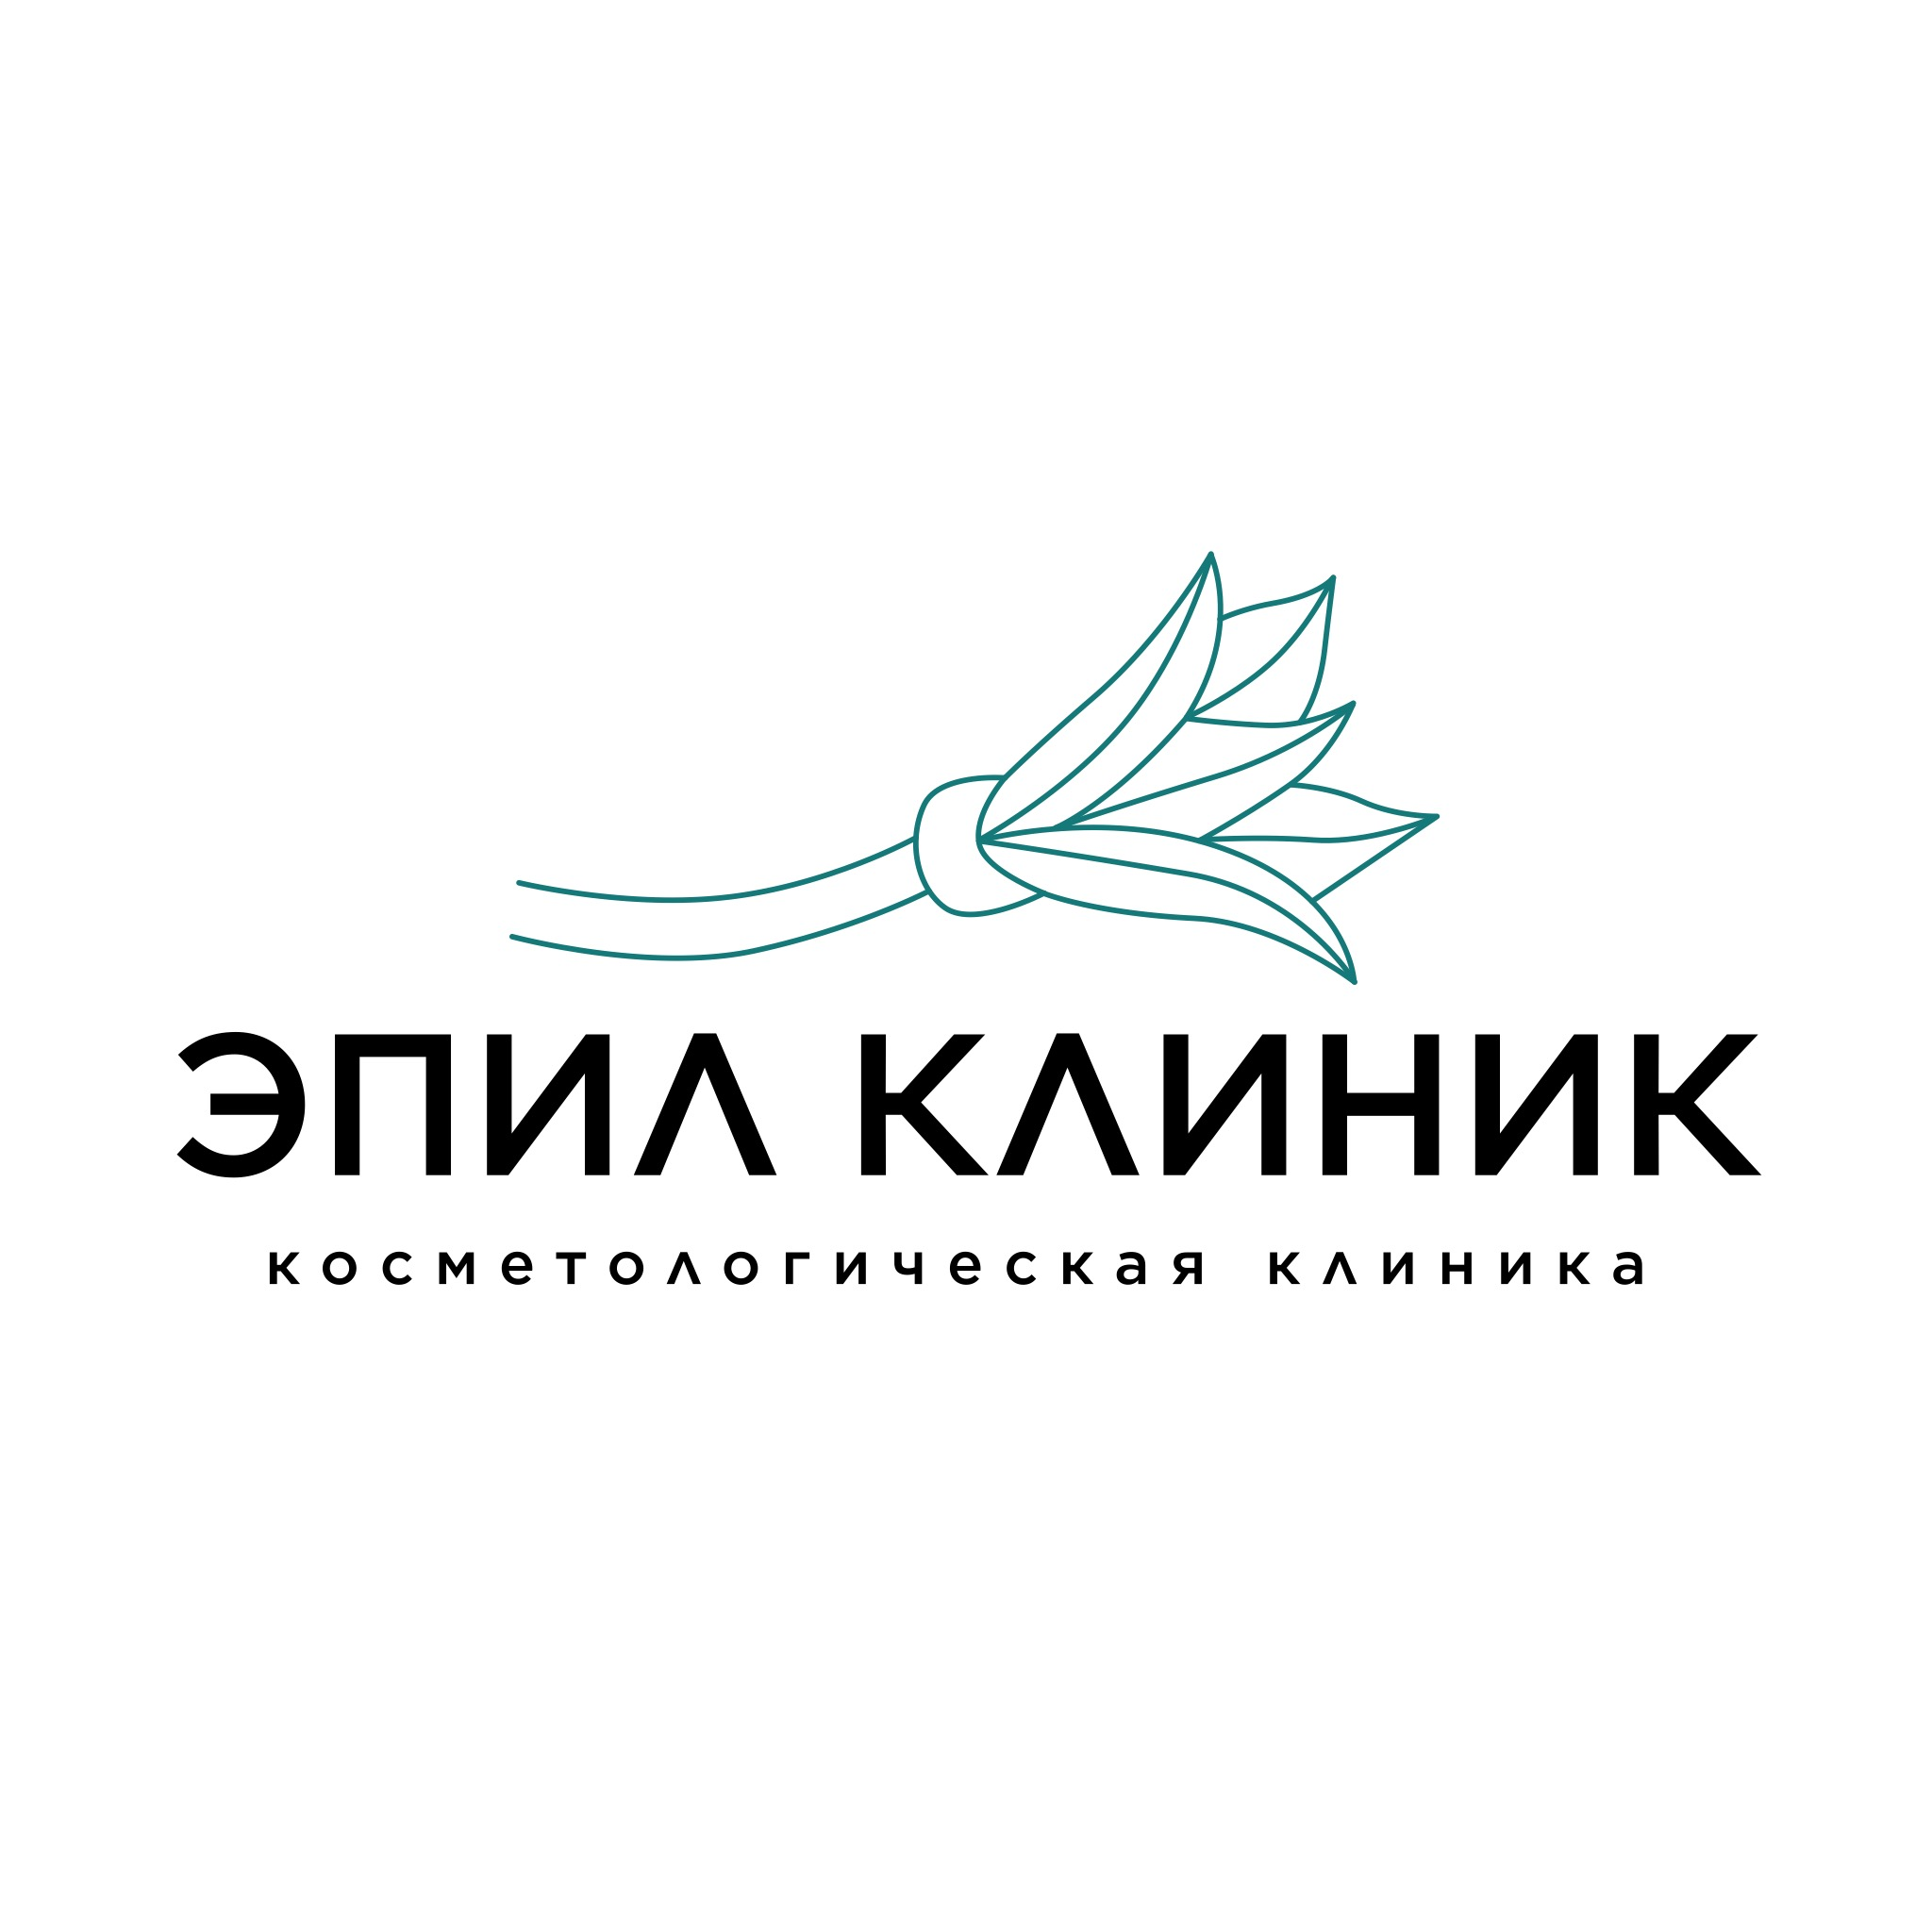 Логотип , фирменный стиль  фото f_0245e19df0b53da1.jpg